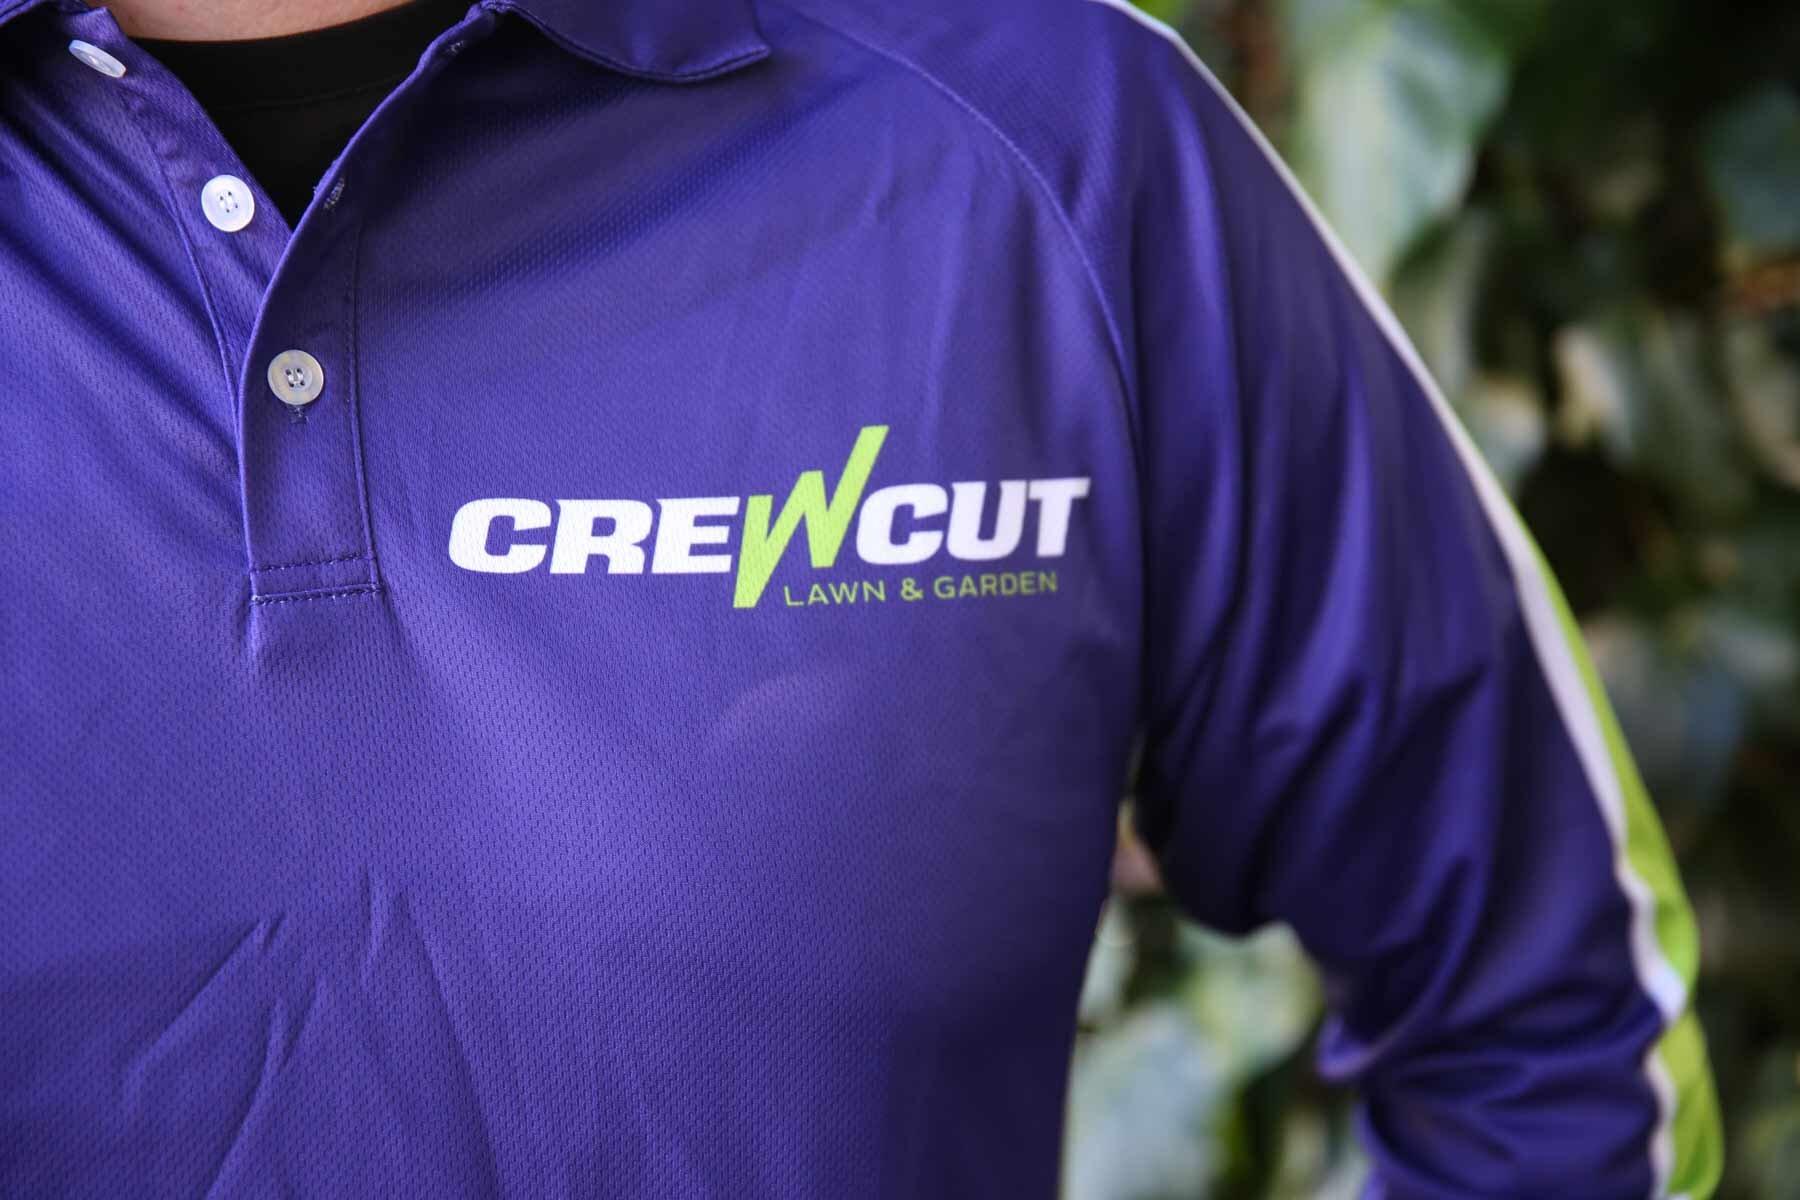 Crewcut uniform